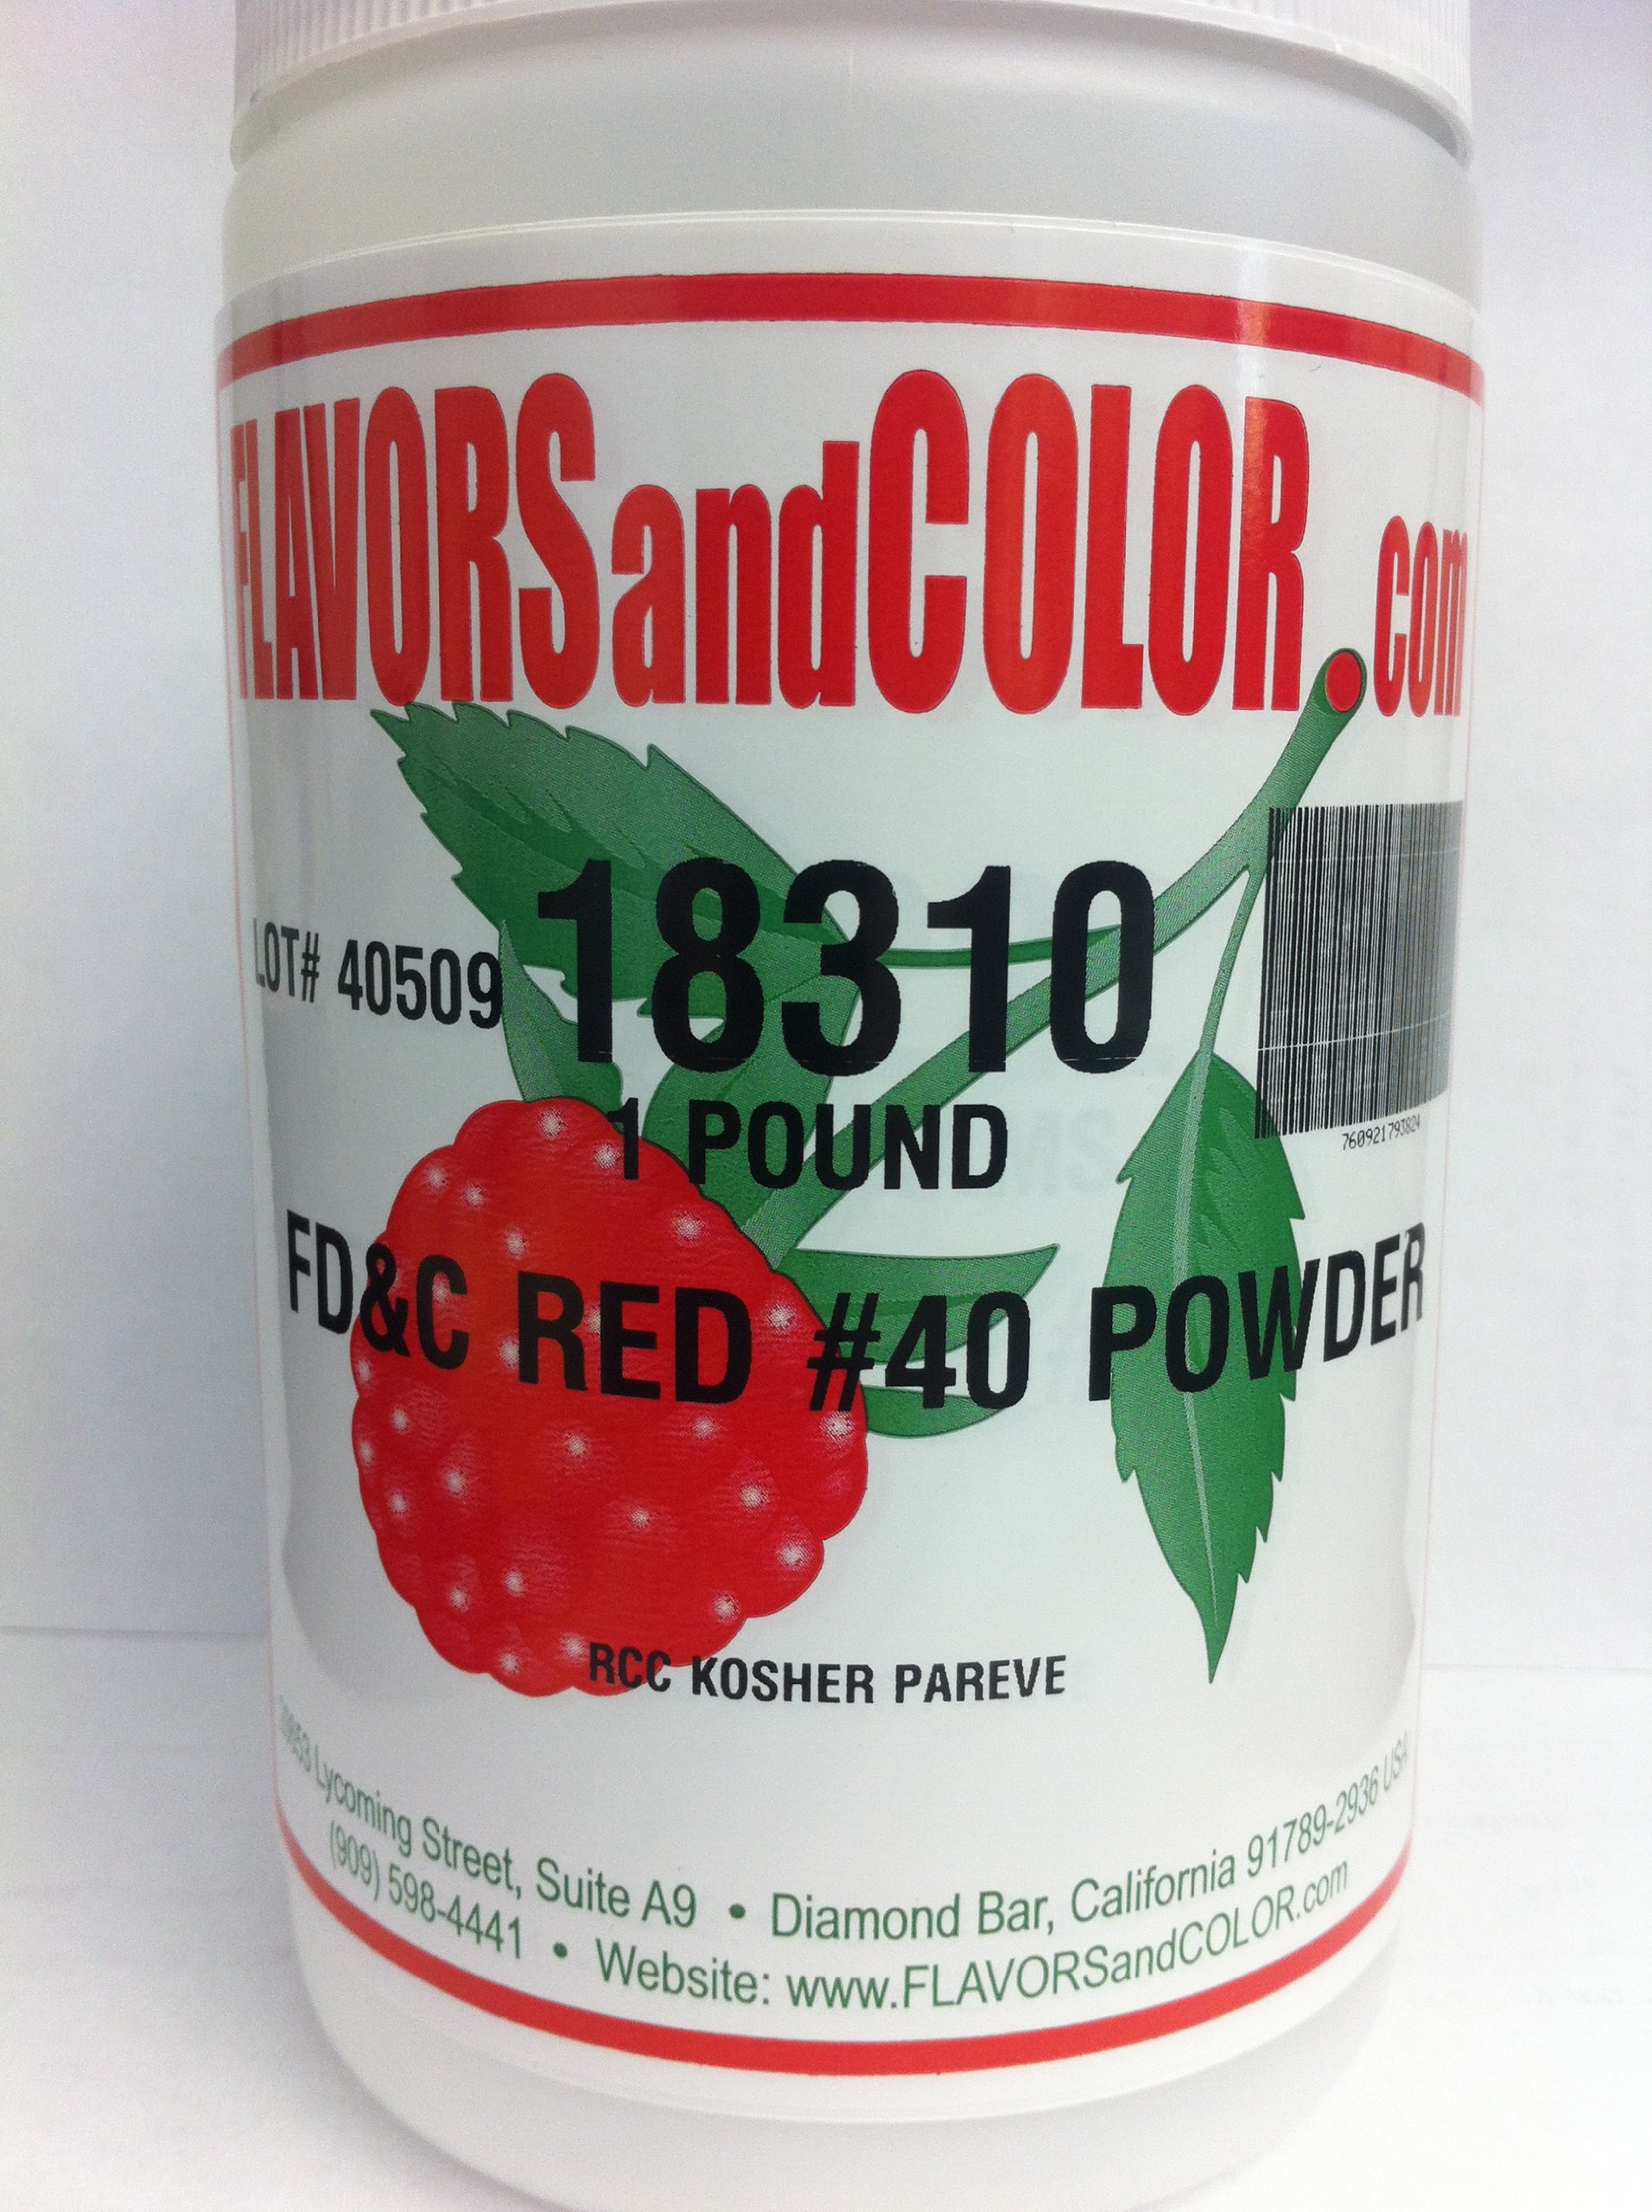 FD&C Red #40 Powder 454 Grams by FLAVORSandCOLOR.com (Image #1)